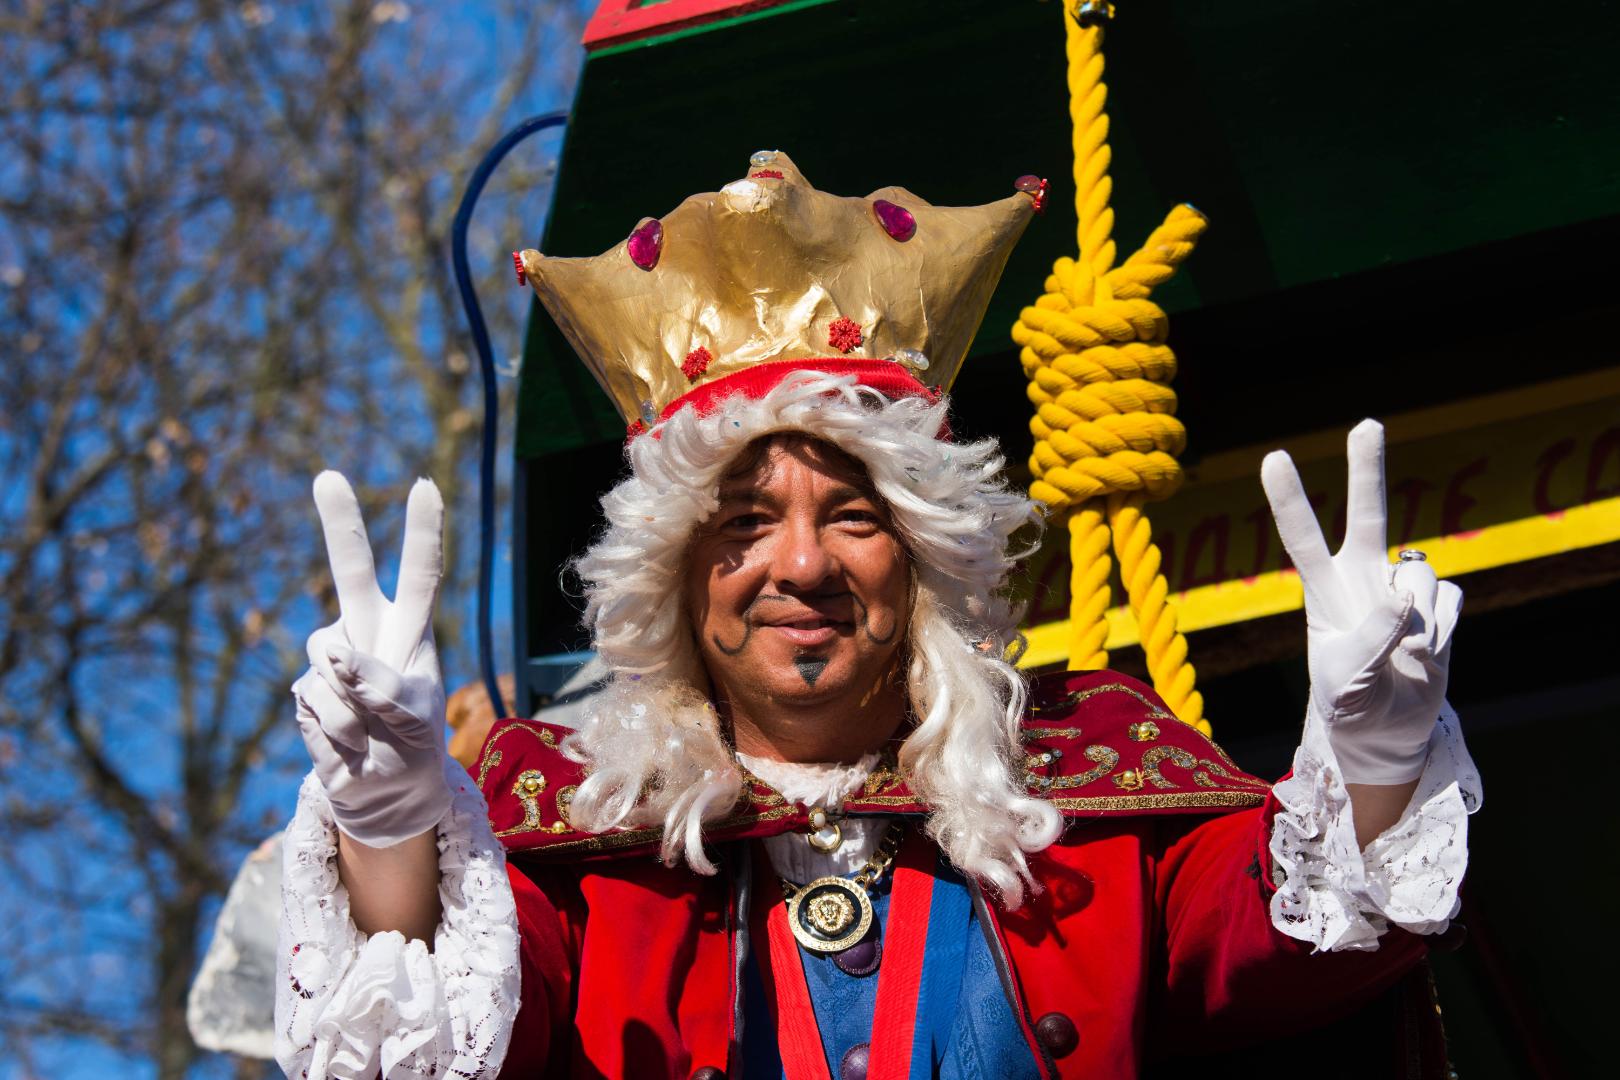 carnaval2019-2 (2021_02_07 10_18_26 UTC)